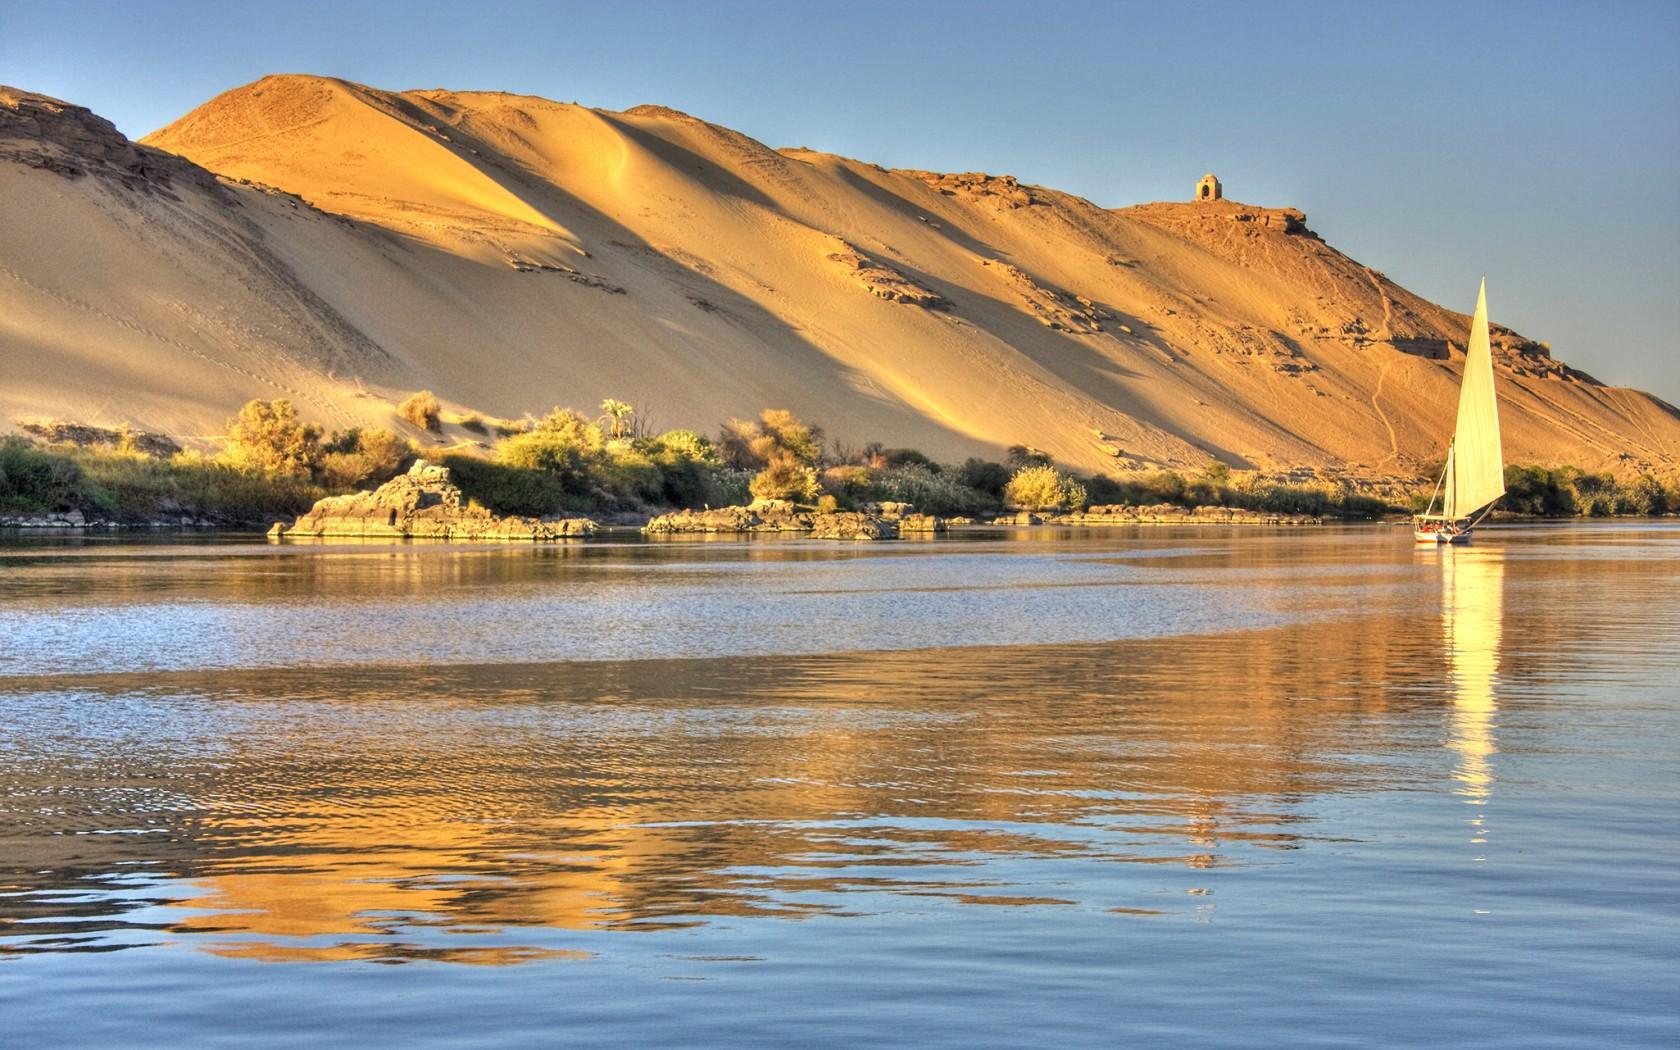 صور صور من نهر النيل , اجمل صور ل اطول الانهار